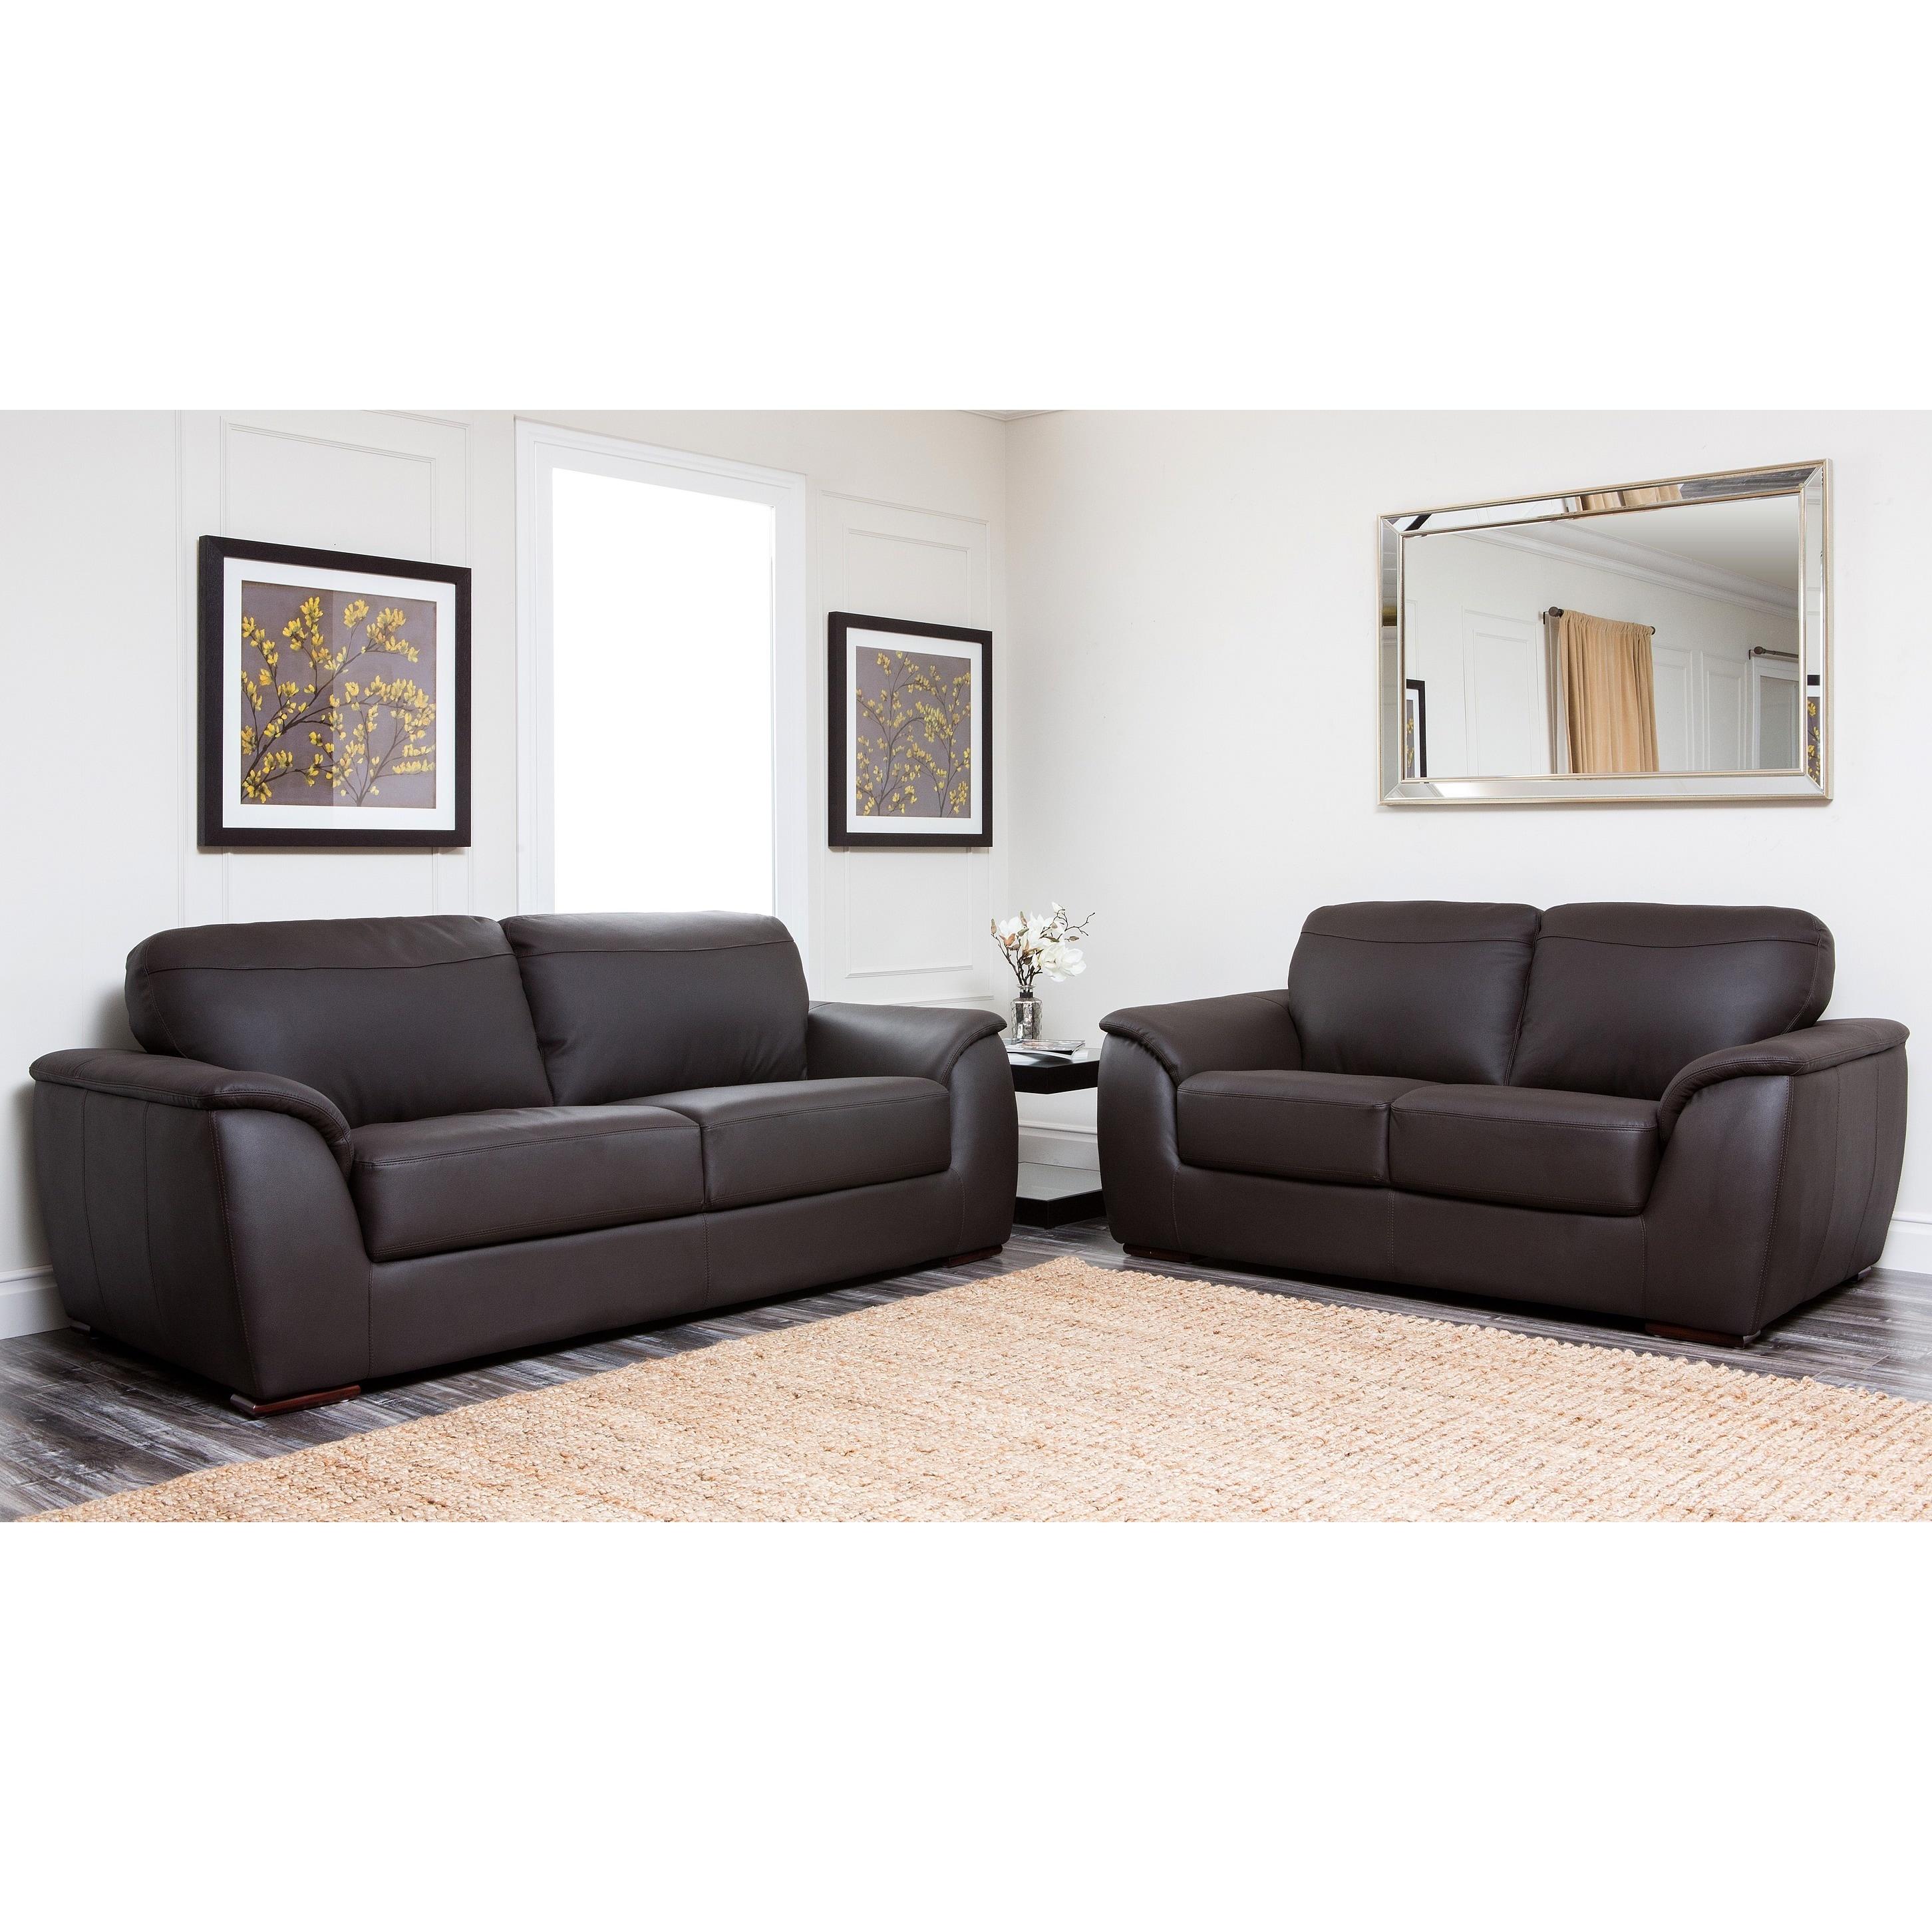 Abbyson Ashton Brown Top Grain Leather 2 Piece Living Room Set ...